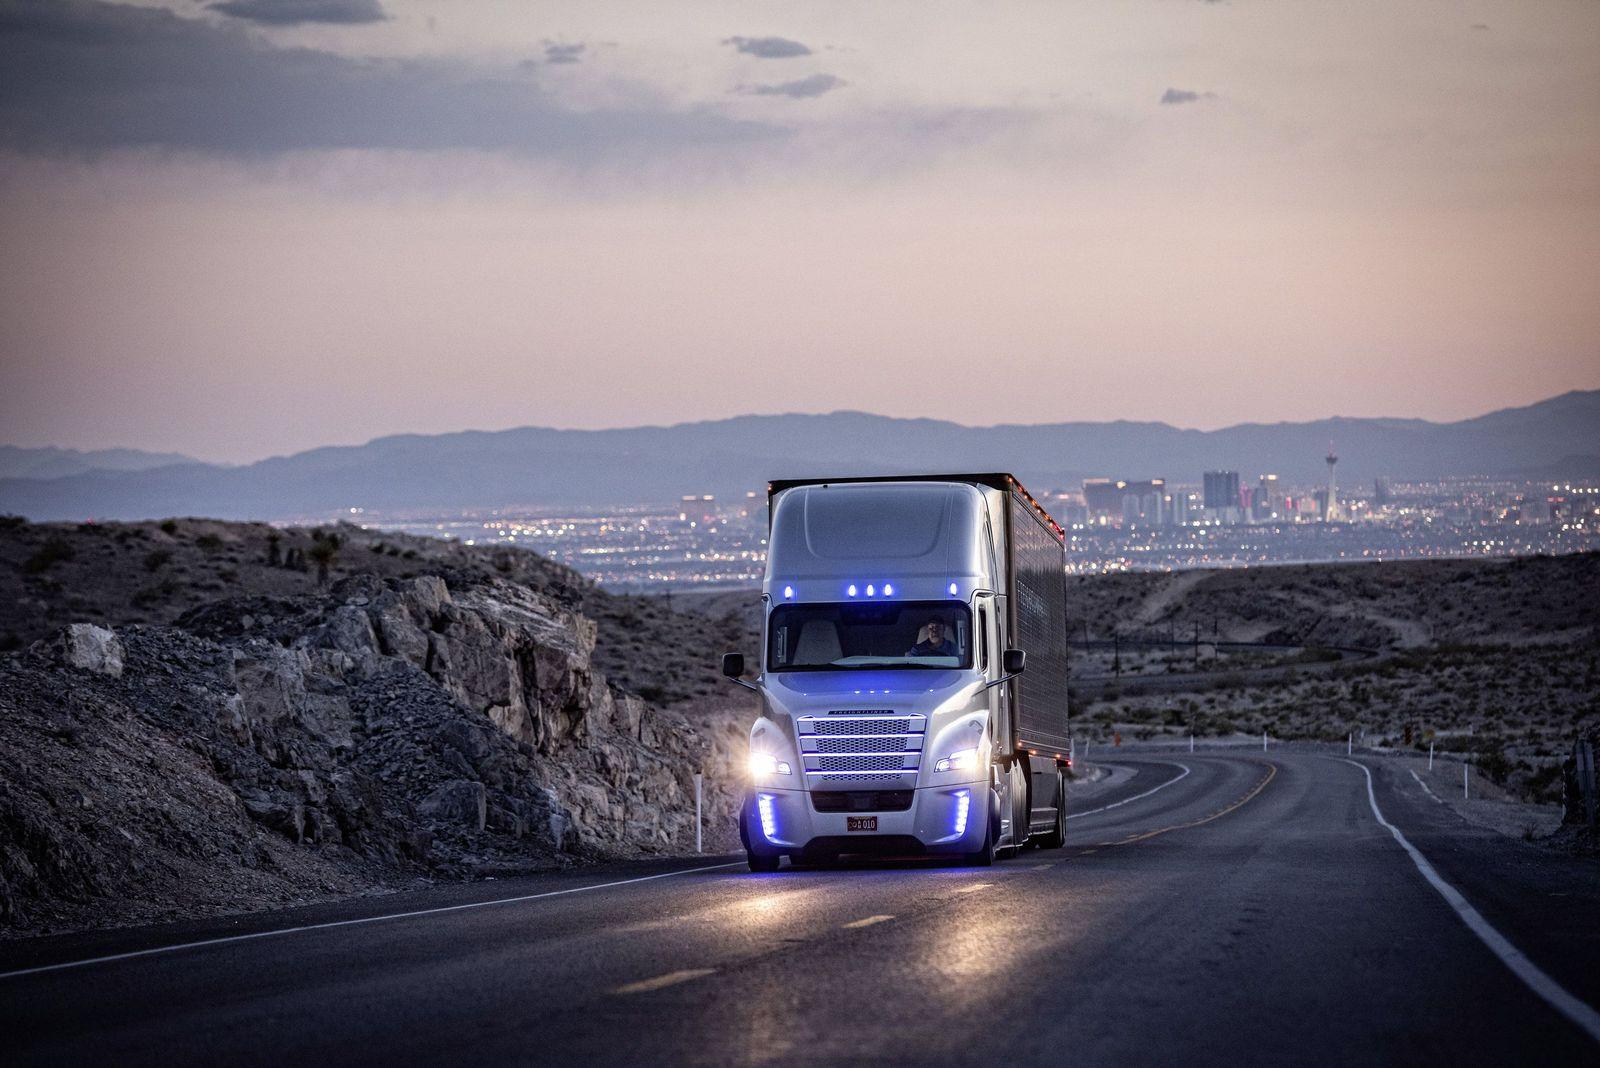 Selbstfahrenden Daimler-Truck